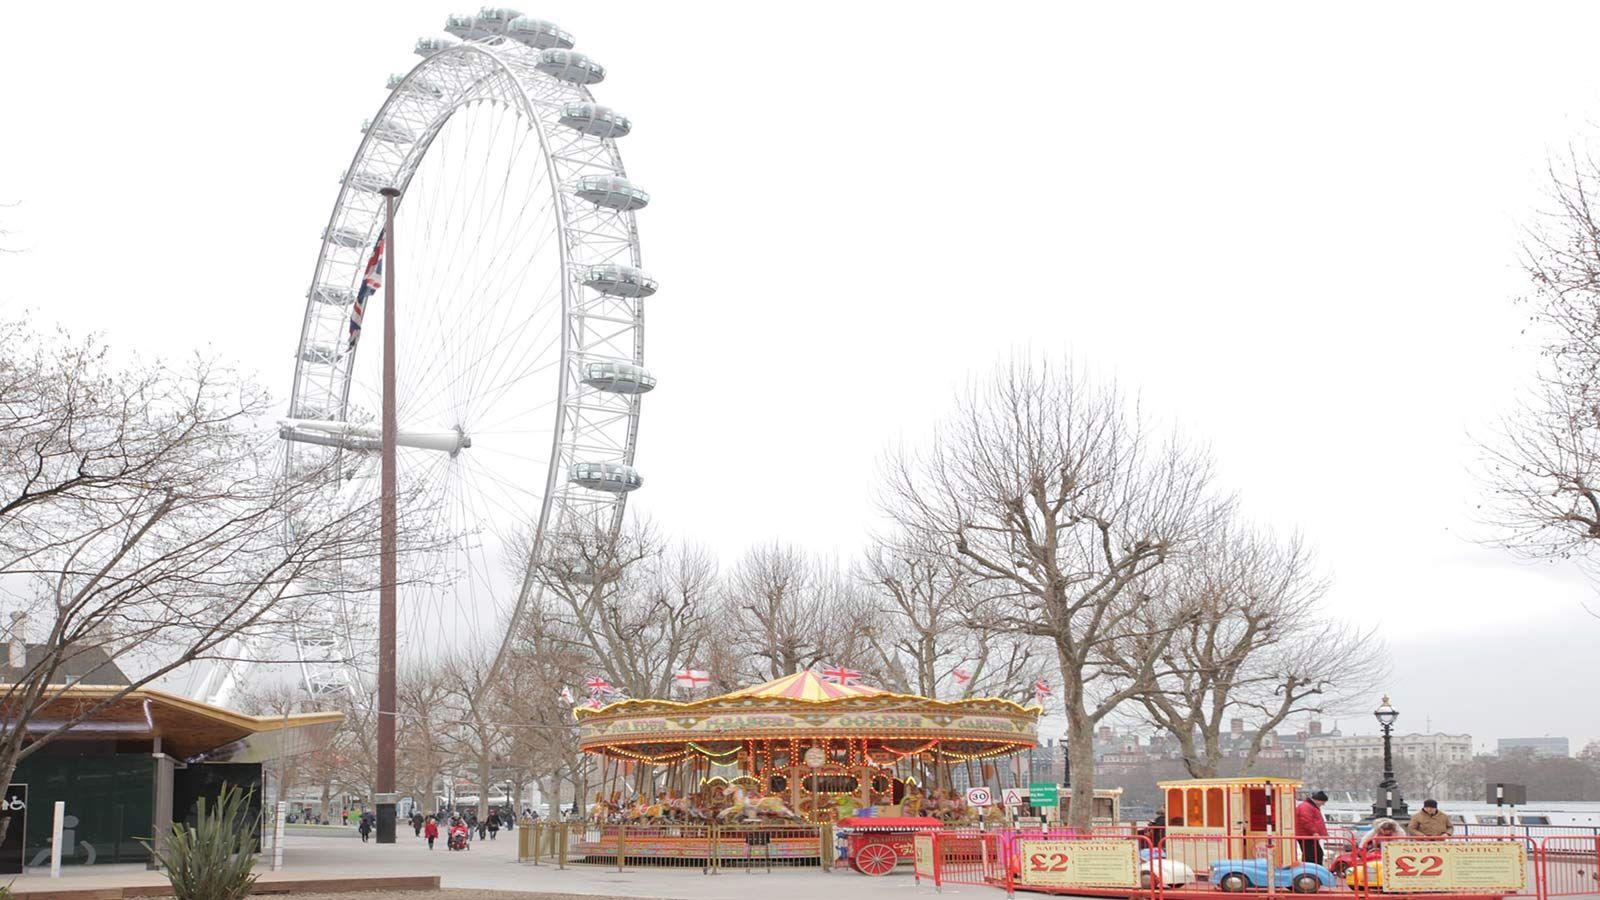 London Eye Theme Park - Mace Group